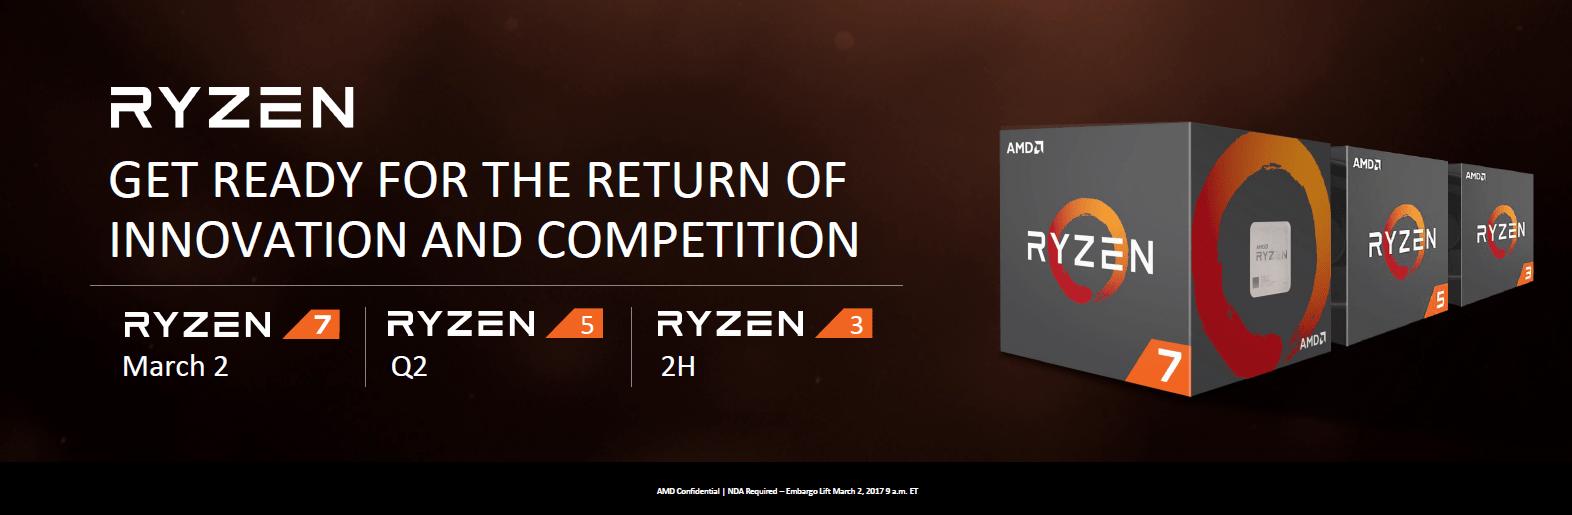 AMD-Ryzen-5-and-Ryzen-3-Series-Launching-In-2-H2-2017